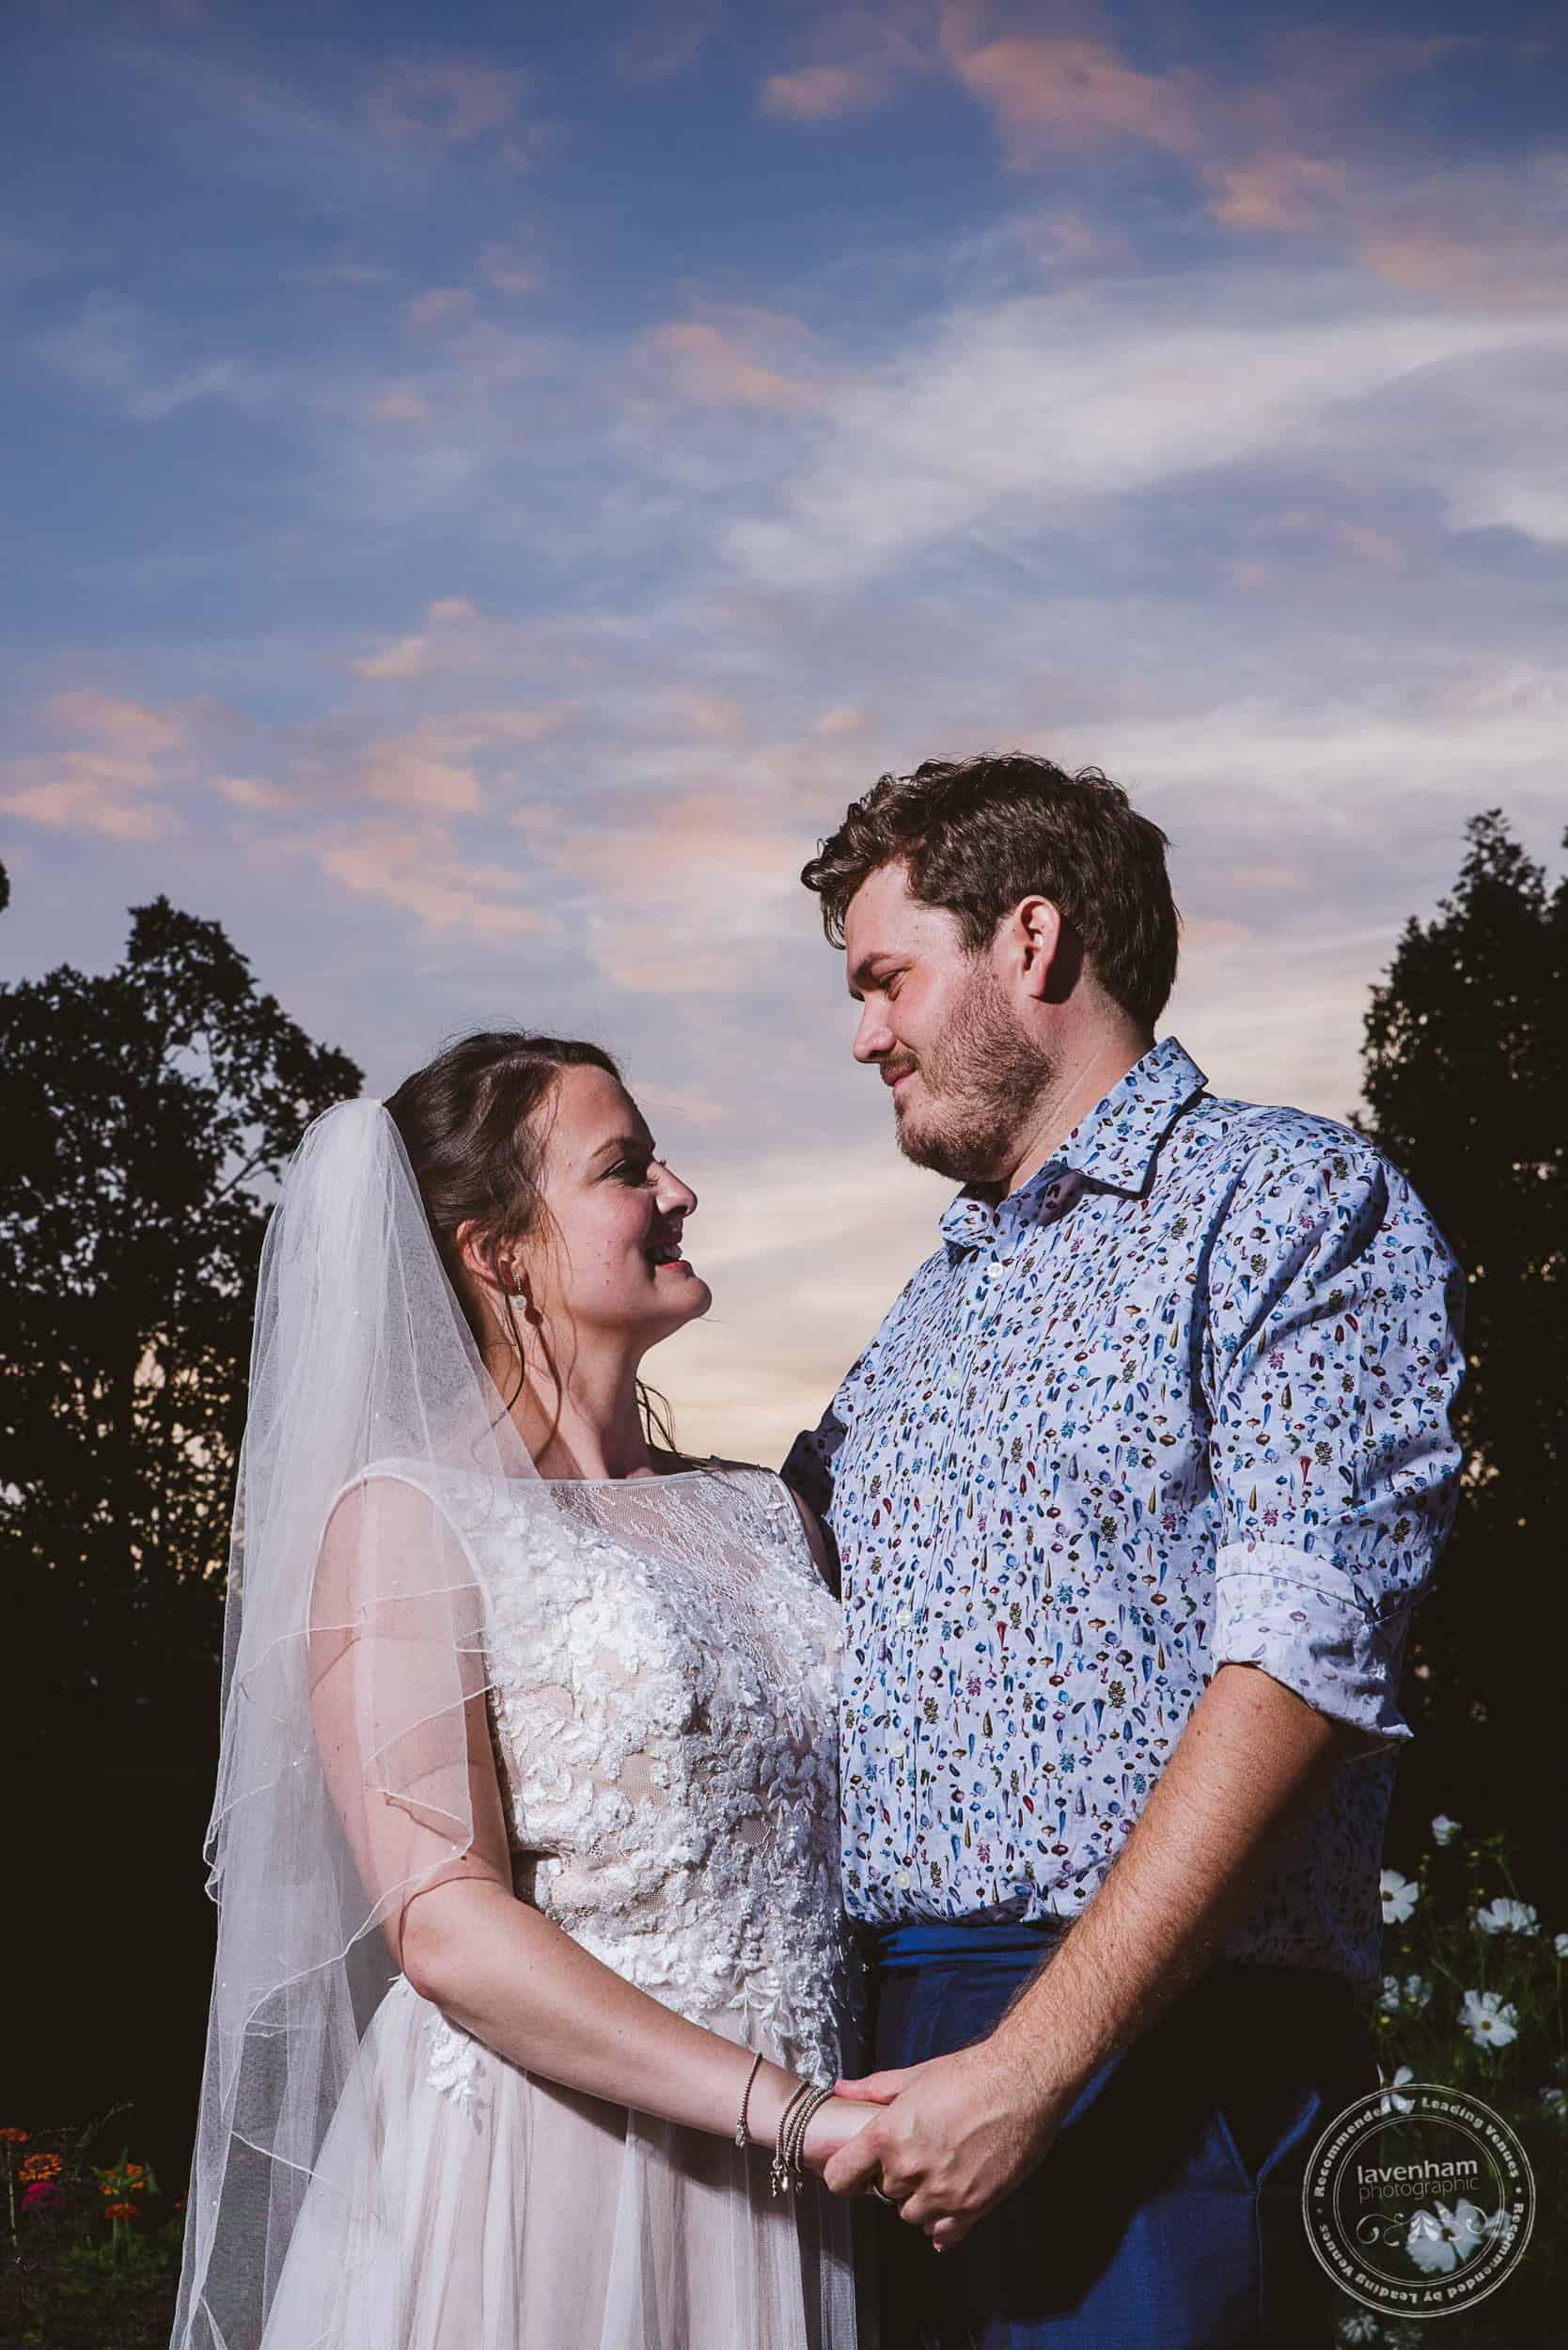 180818 Marks Hall Wedding Photography Lavenham Photographic 140